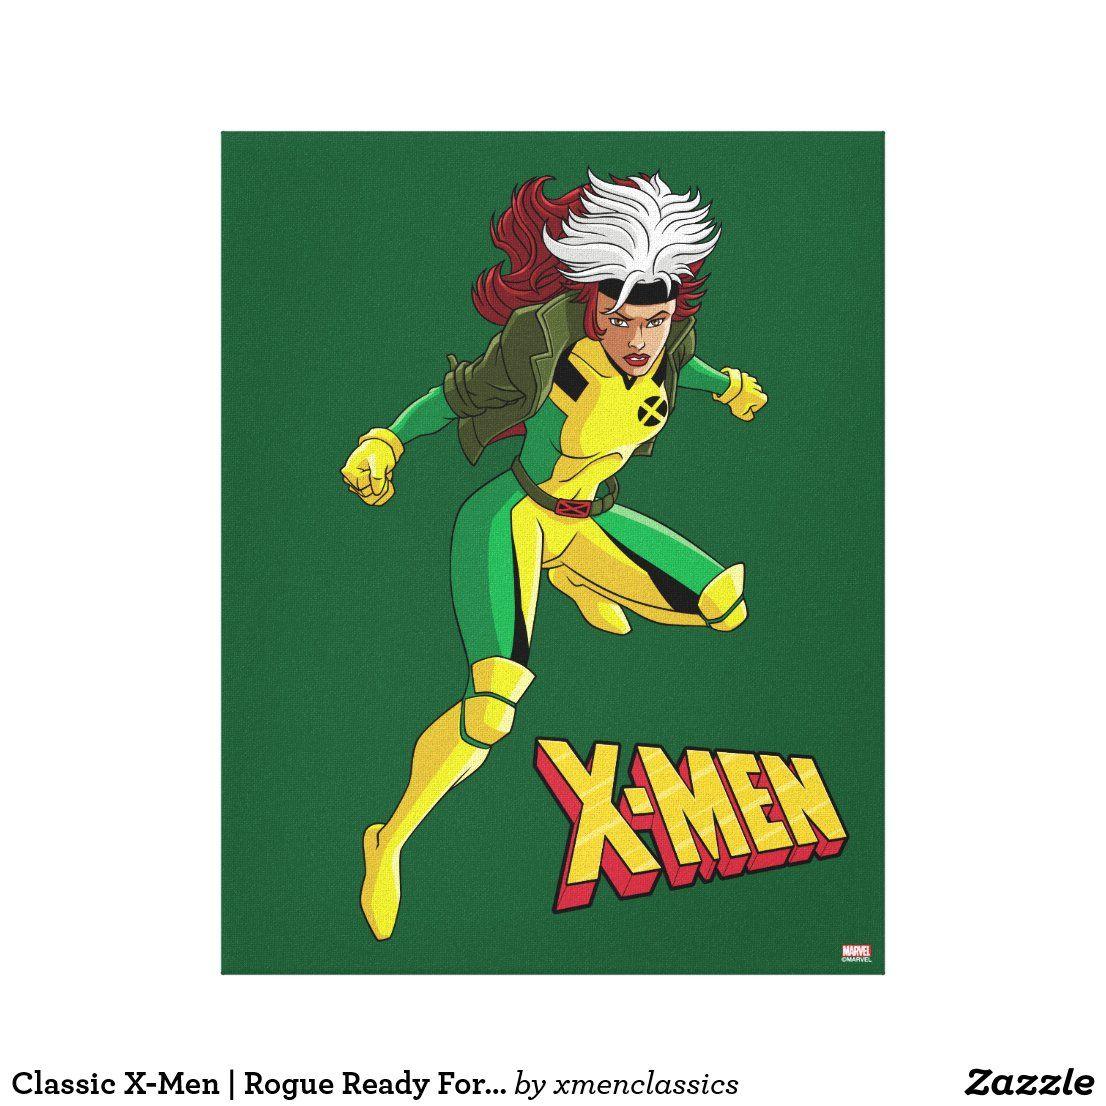 Classic X Men Rogue Ready For Battle Canvas Print Zazzle Com In 2021 Retro Canvas Art Canvas Prints Canvas Art Prints